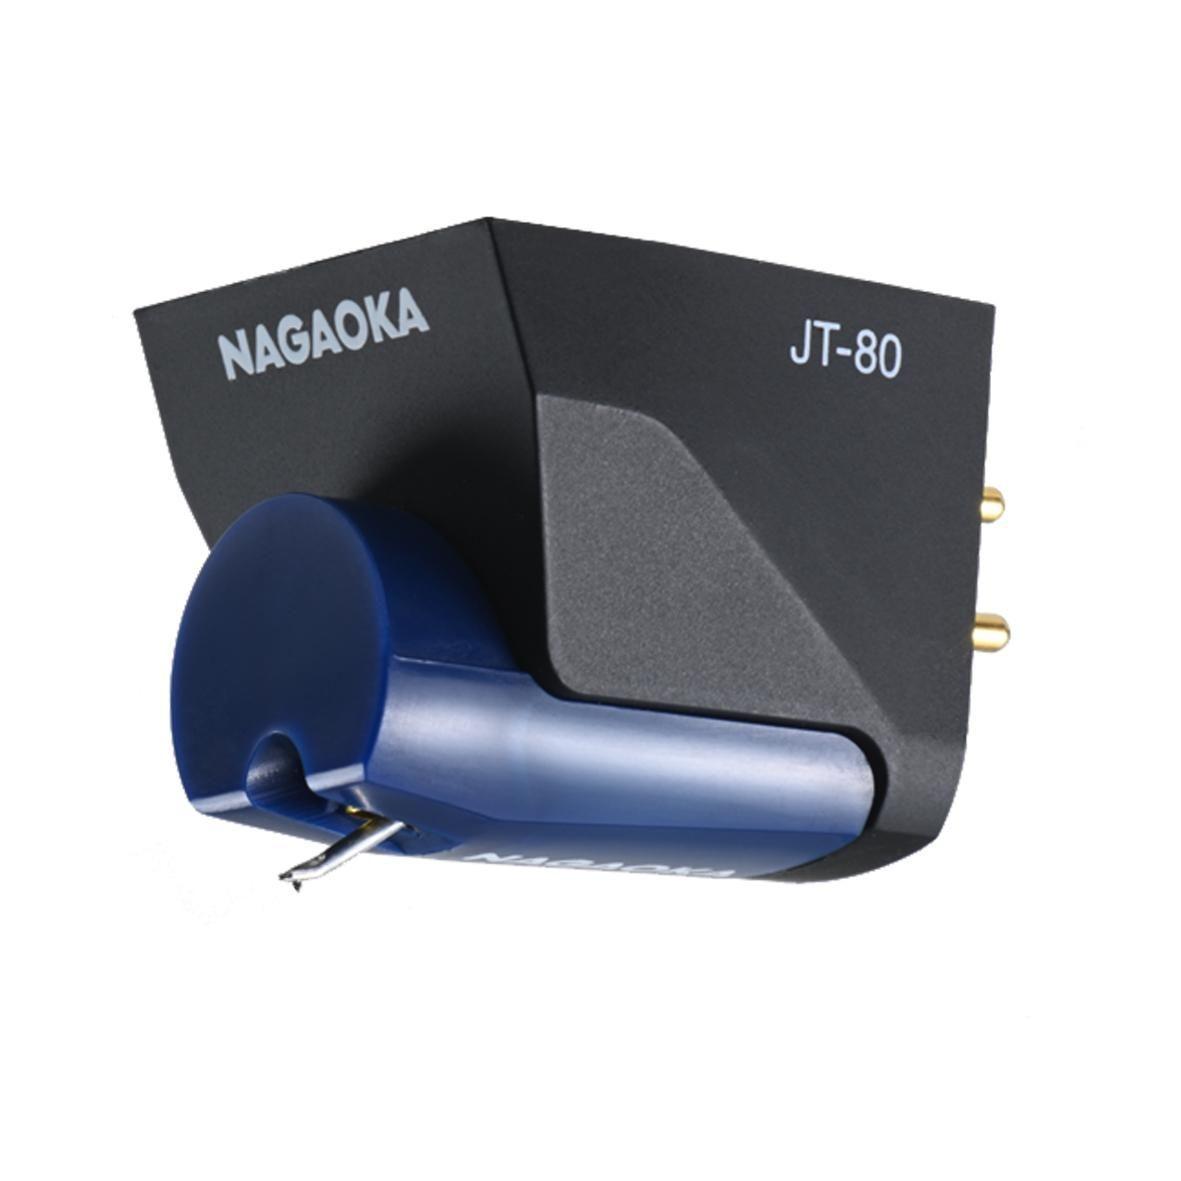 Nagaoka JT 80LB audioperfect